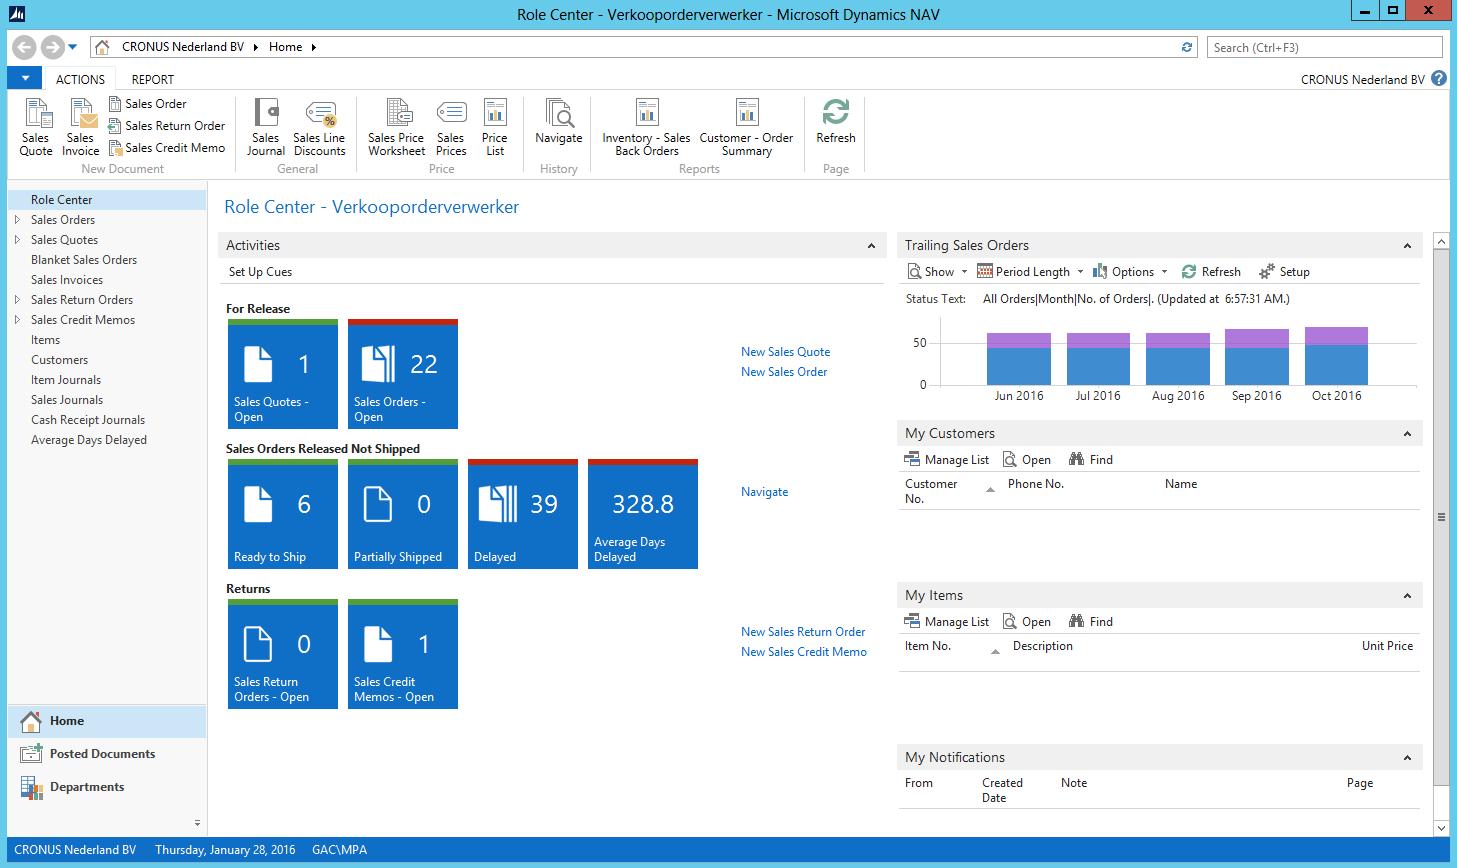 Microsoft Dynamics NAV: Auditierung, Zertifizierung (SAS 70, ISO 27001/2, TRUSTe), Extranet, Intranet & Community